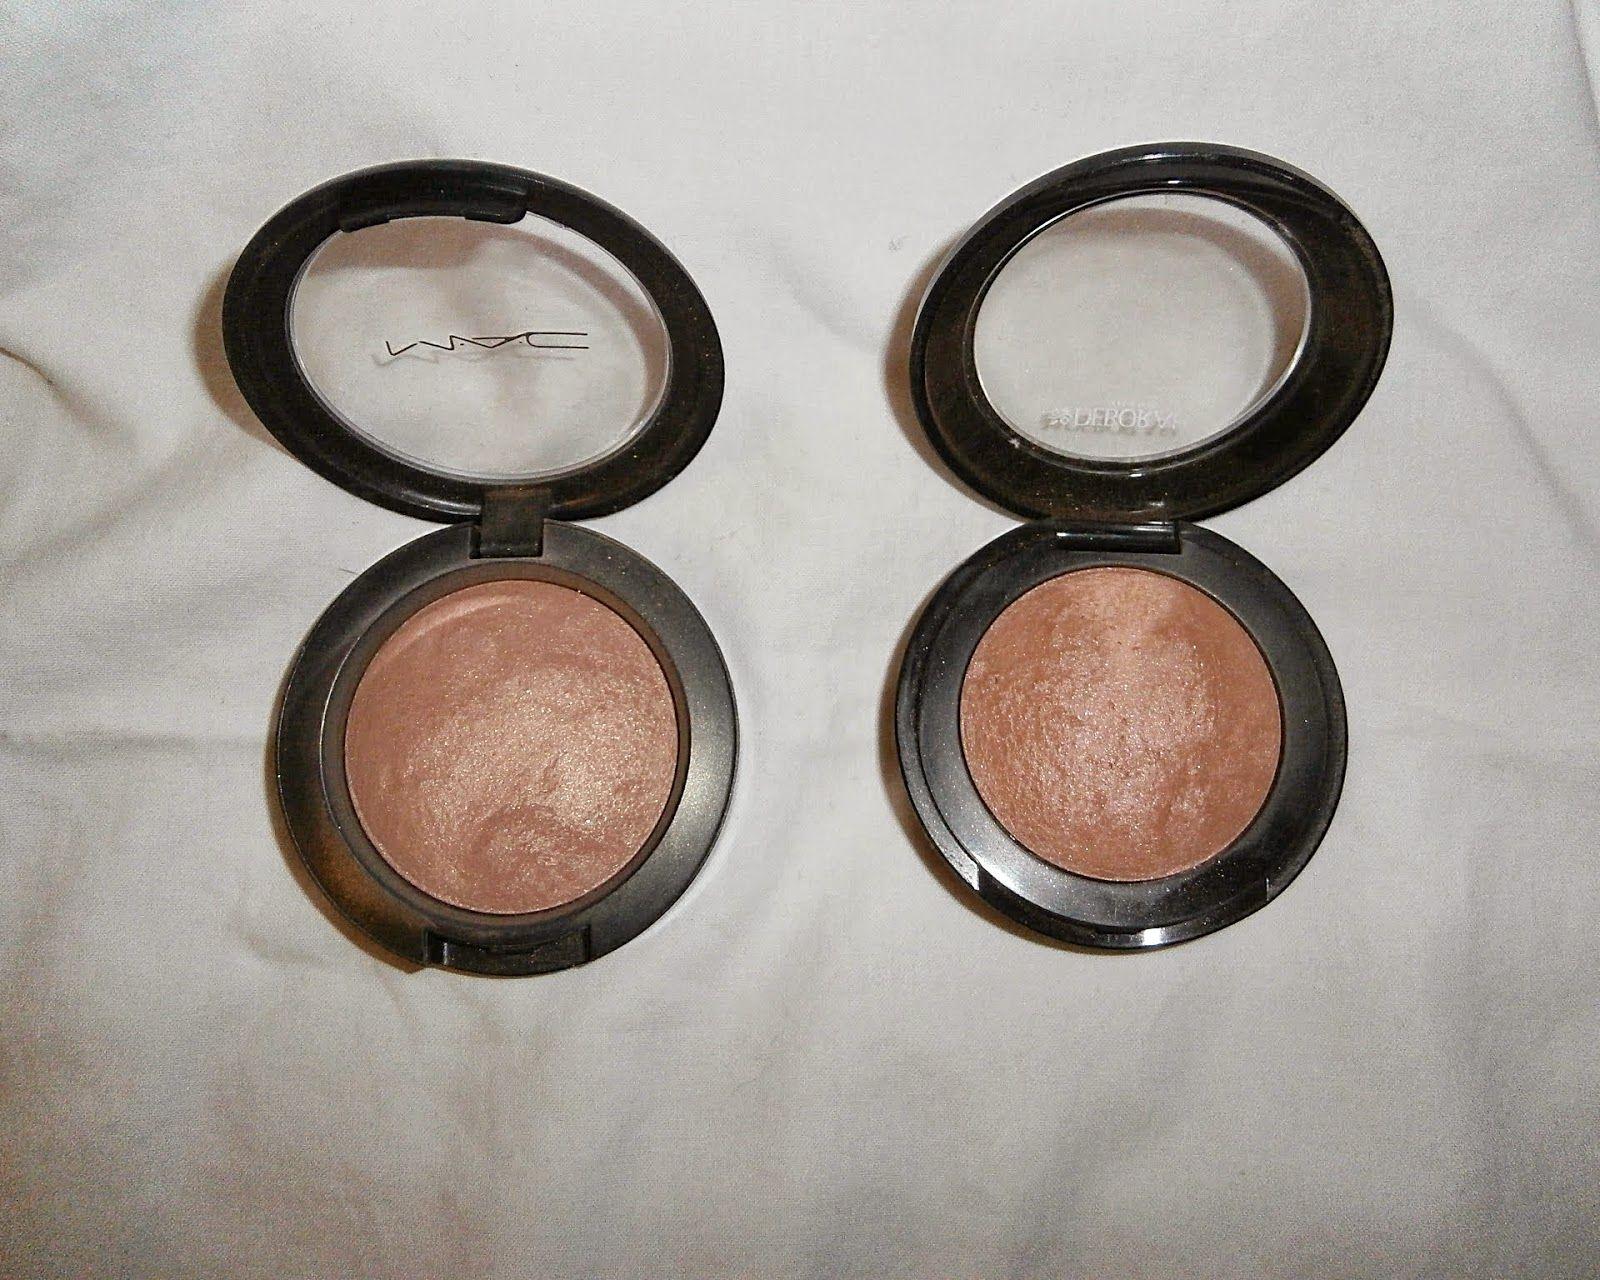 MAC Warm soul Mineralize blush dupe